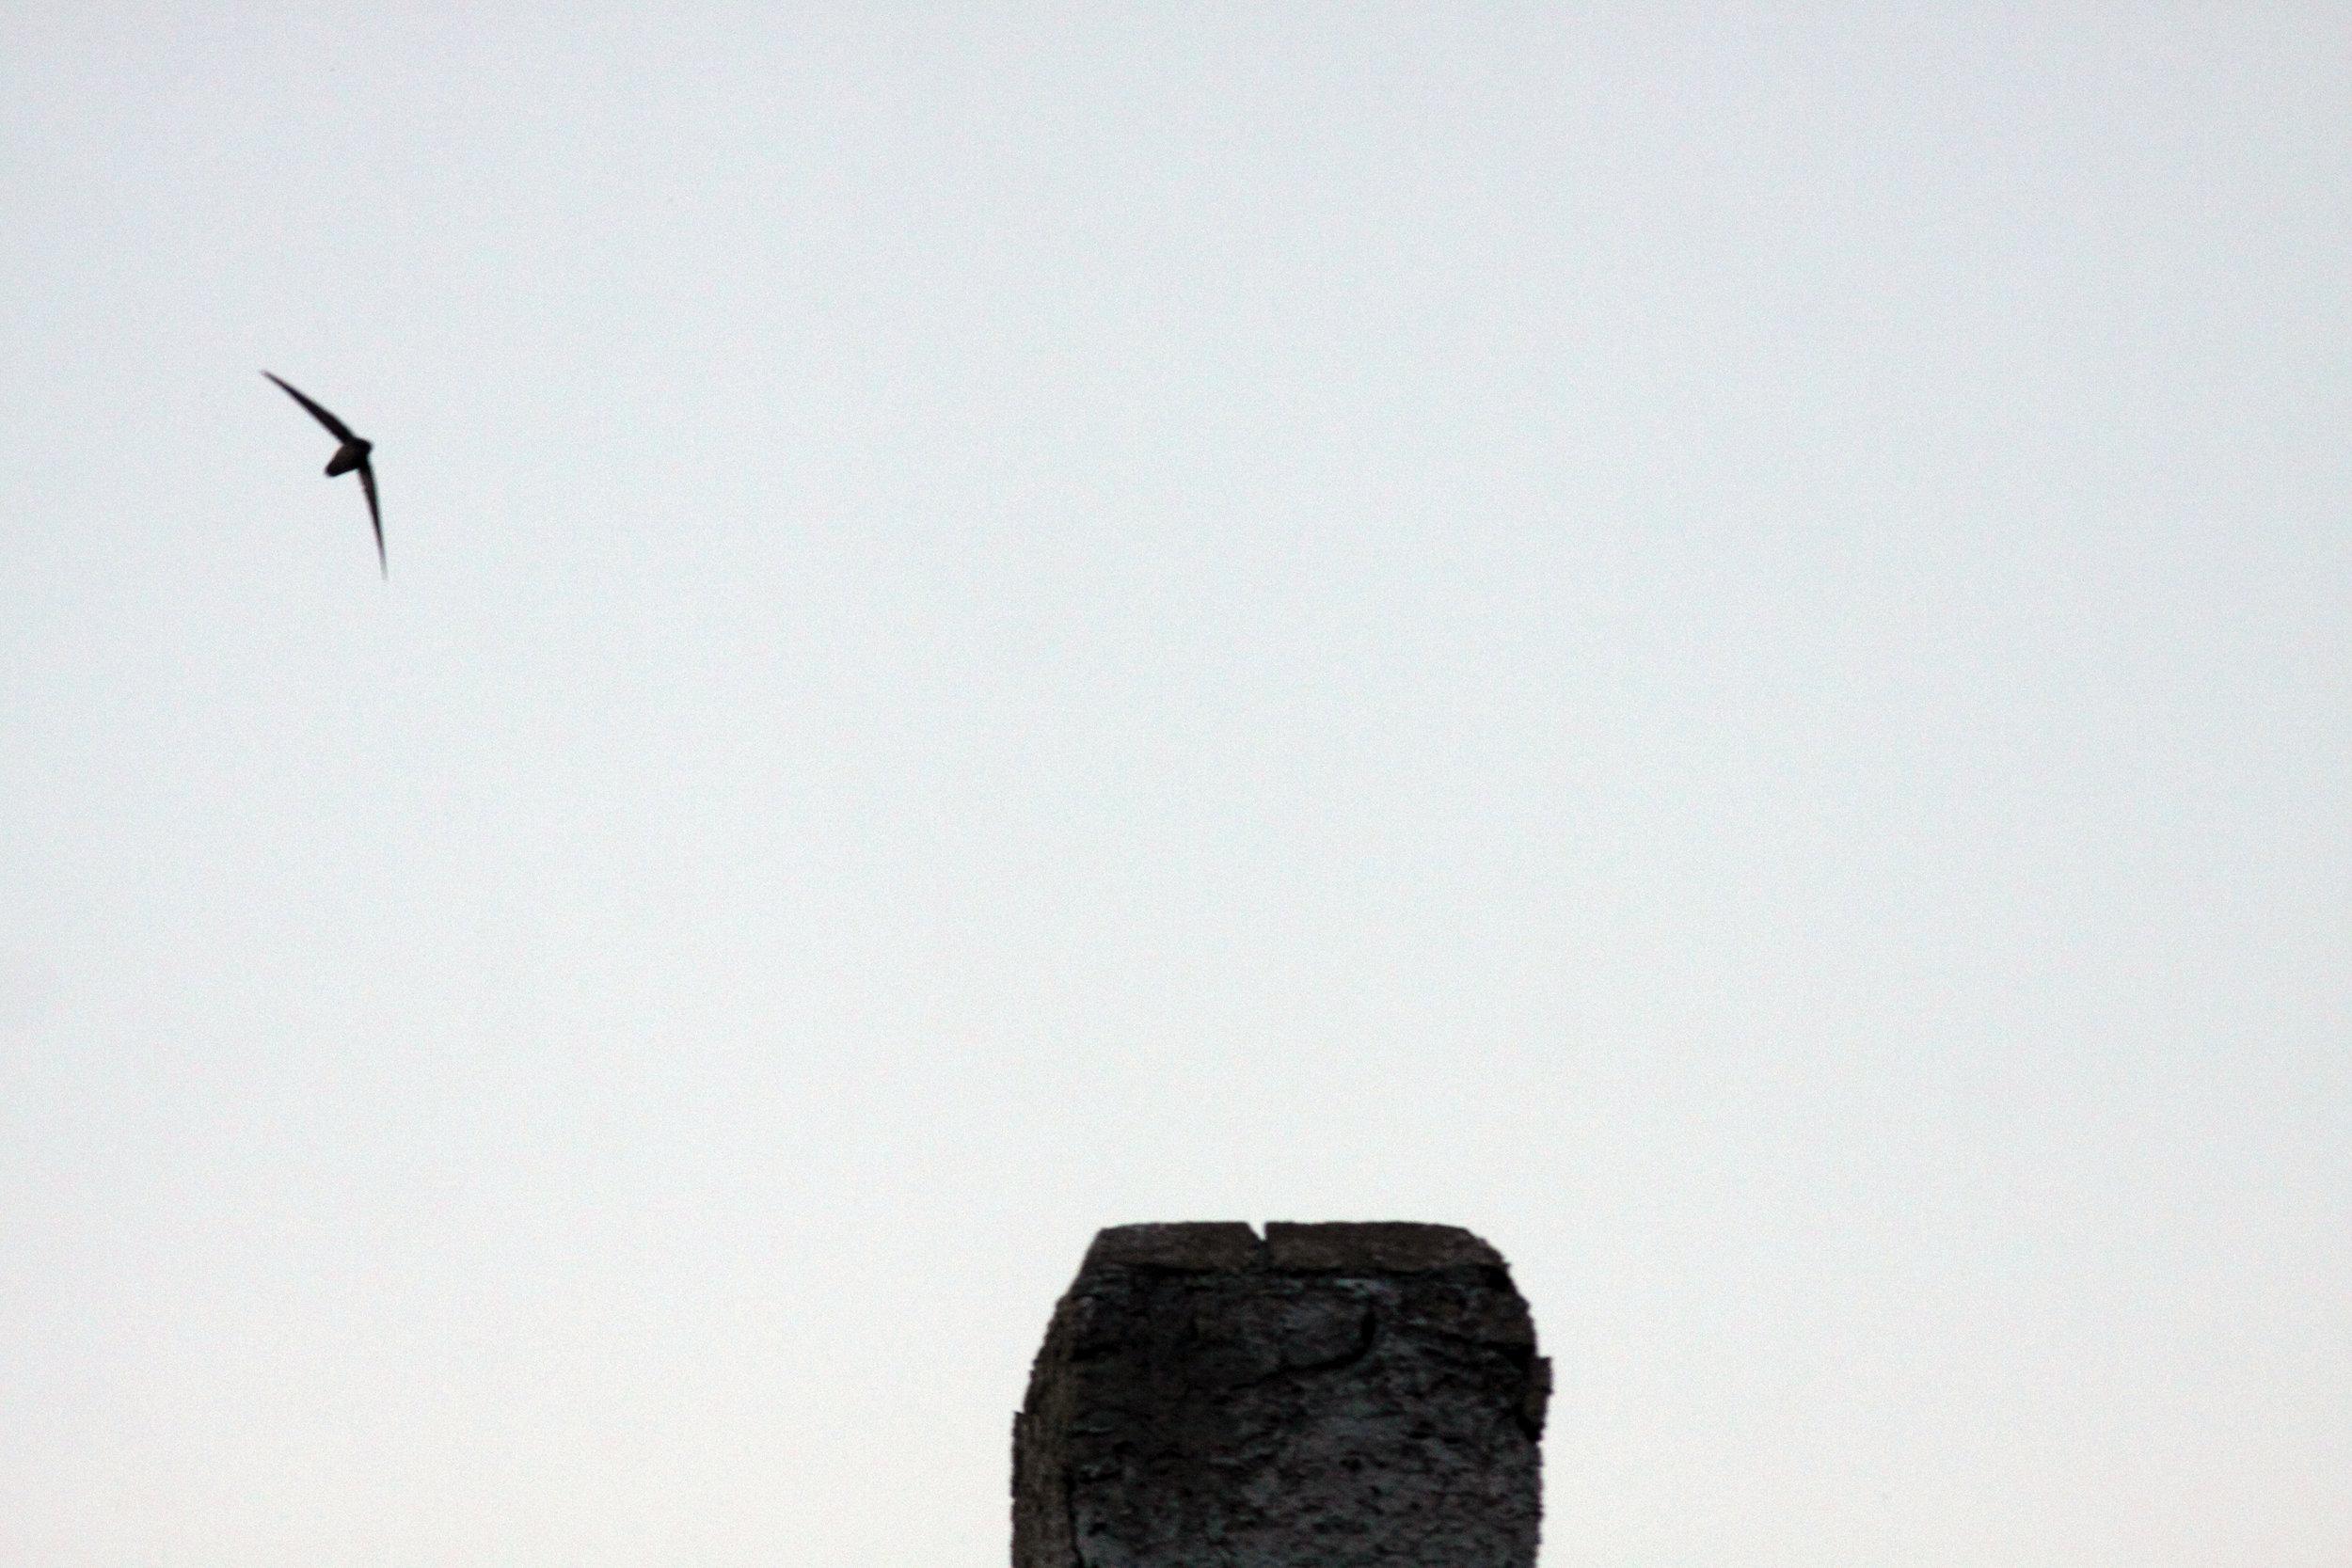 Chimney Swift_1364_chimney_Artuso_large.jpg